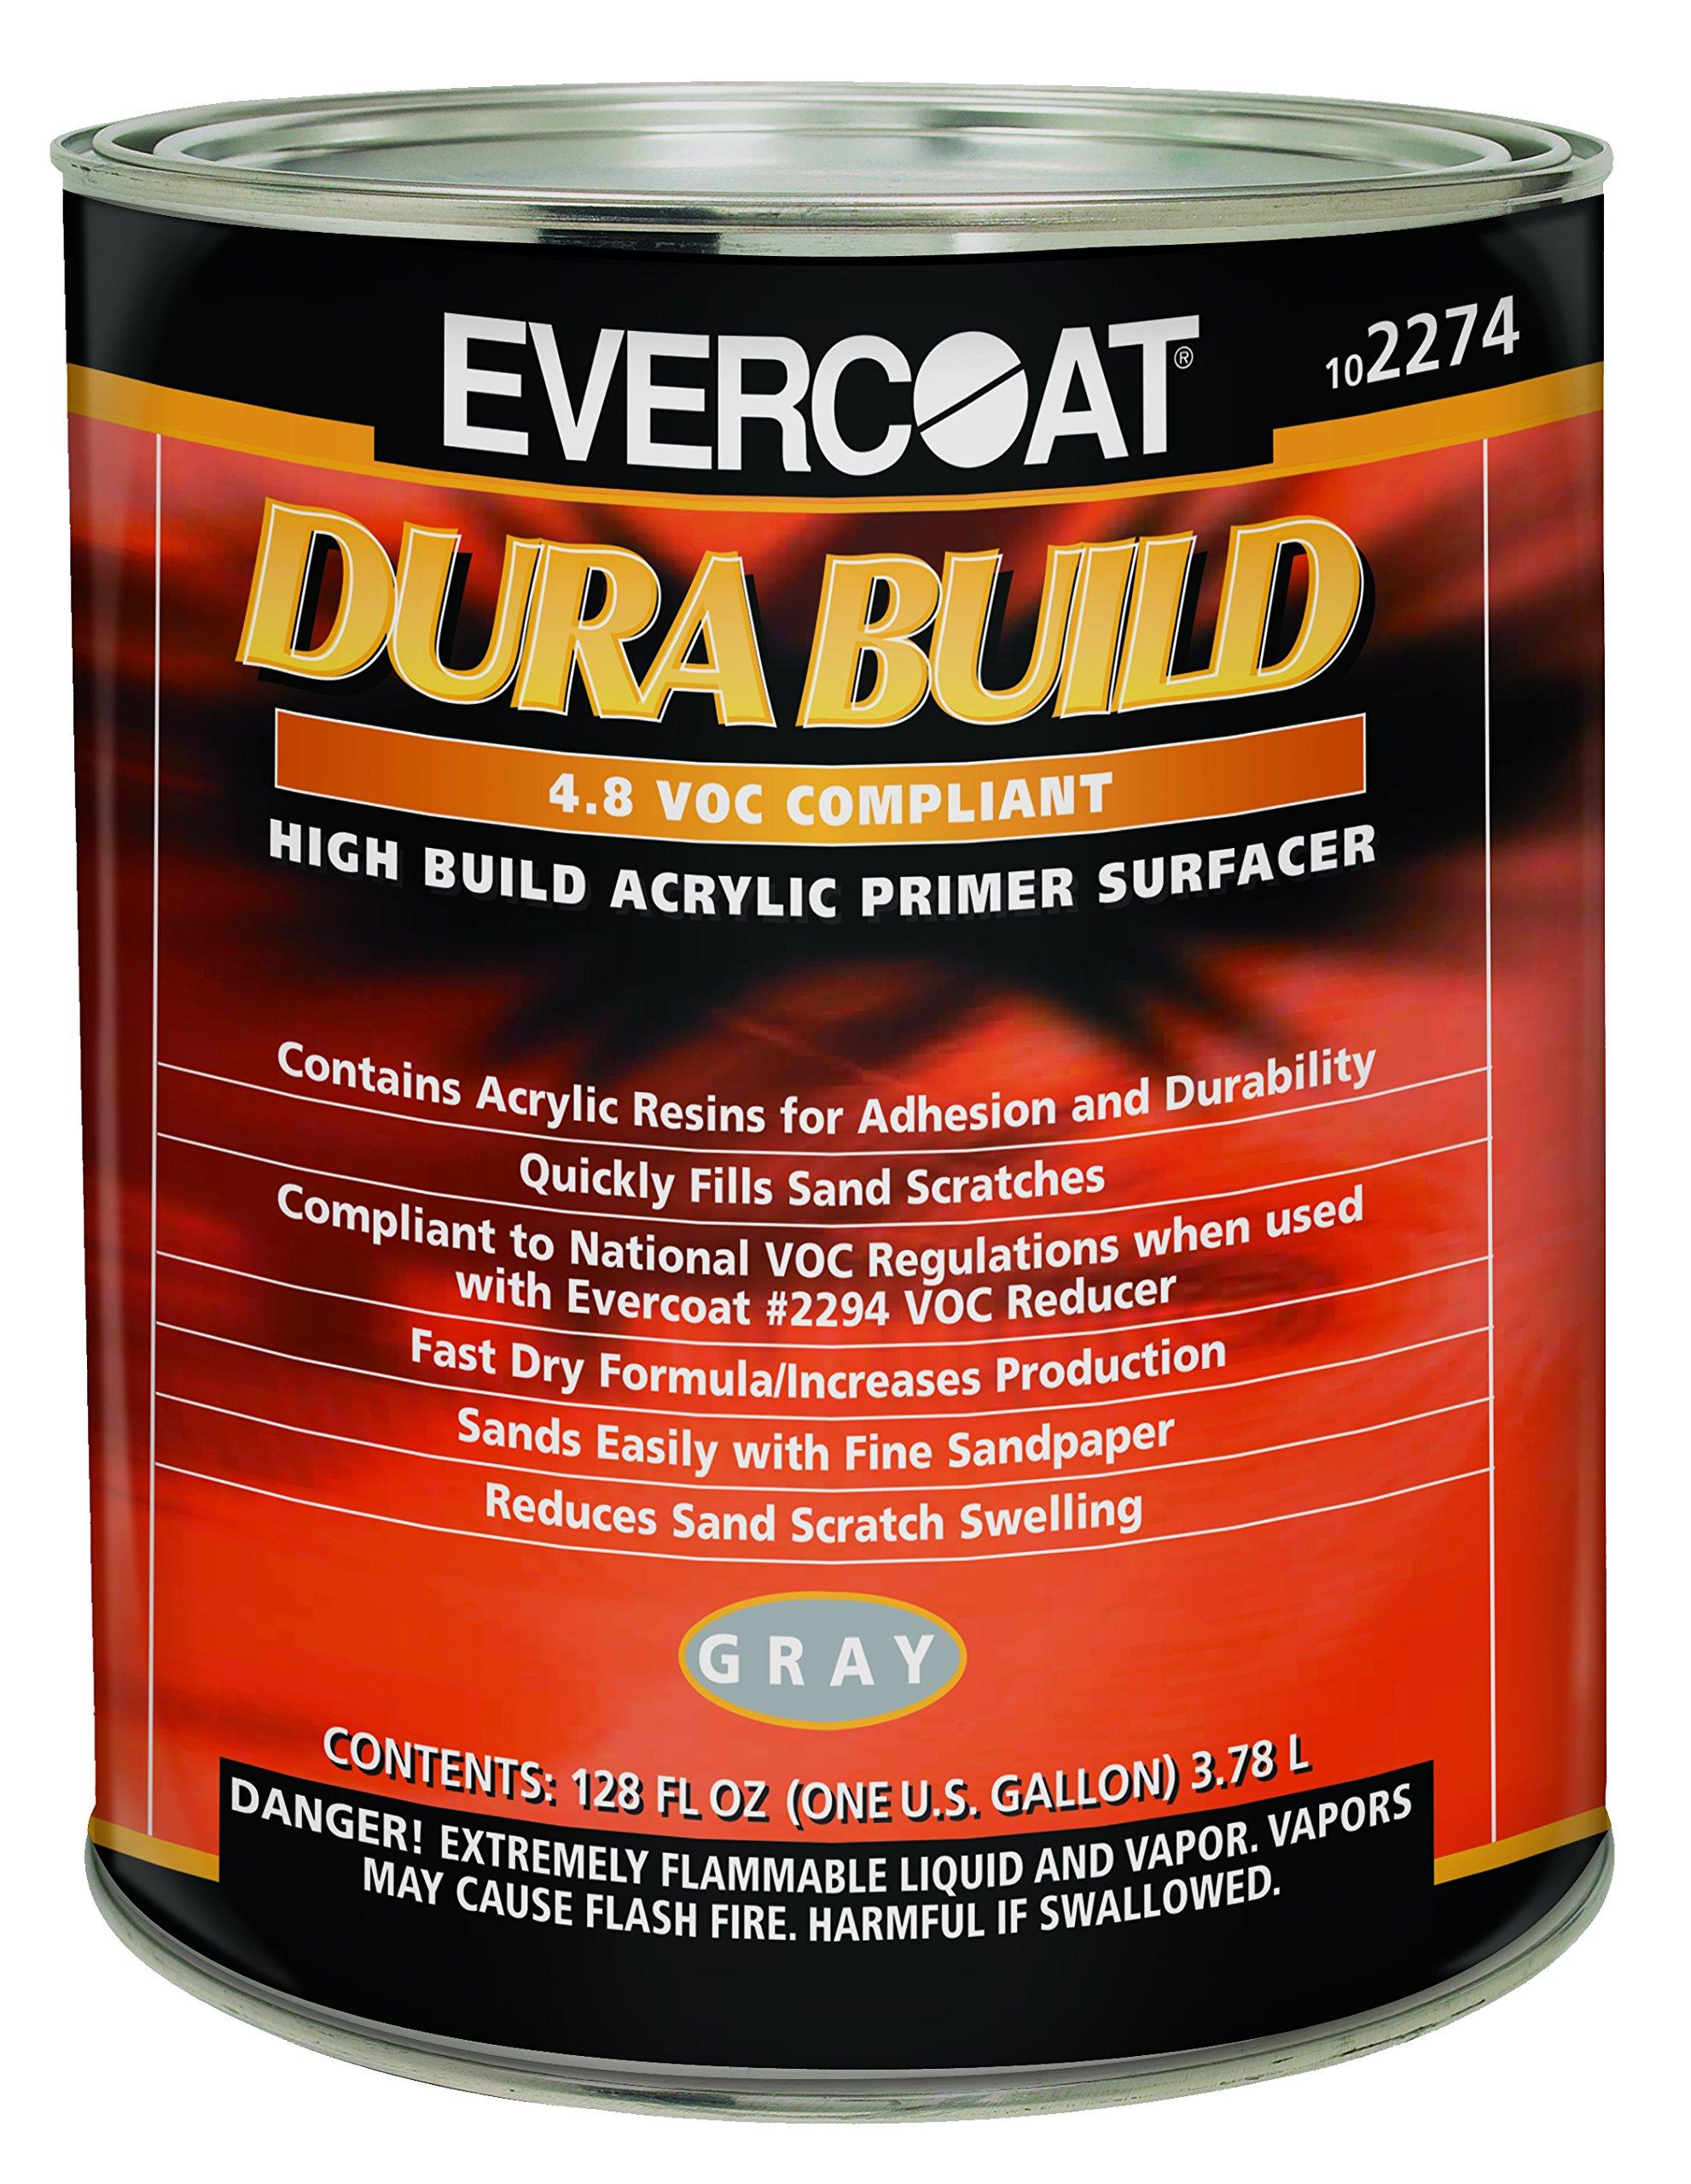 Evercoat 2274 Dura Build Acrylic Primer Surfacer - Gray - Gallon by Evercoat